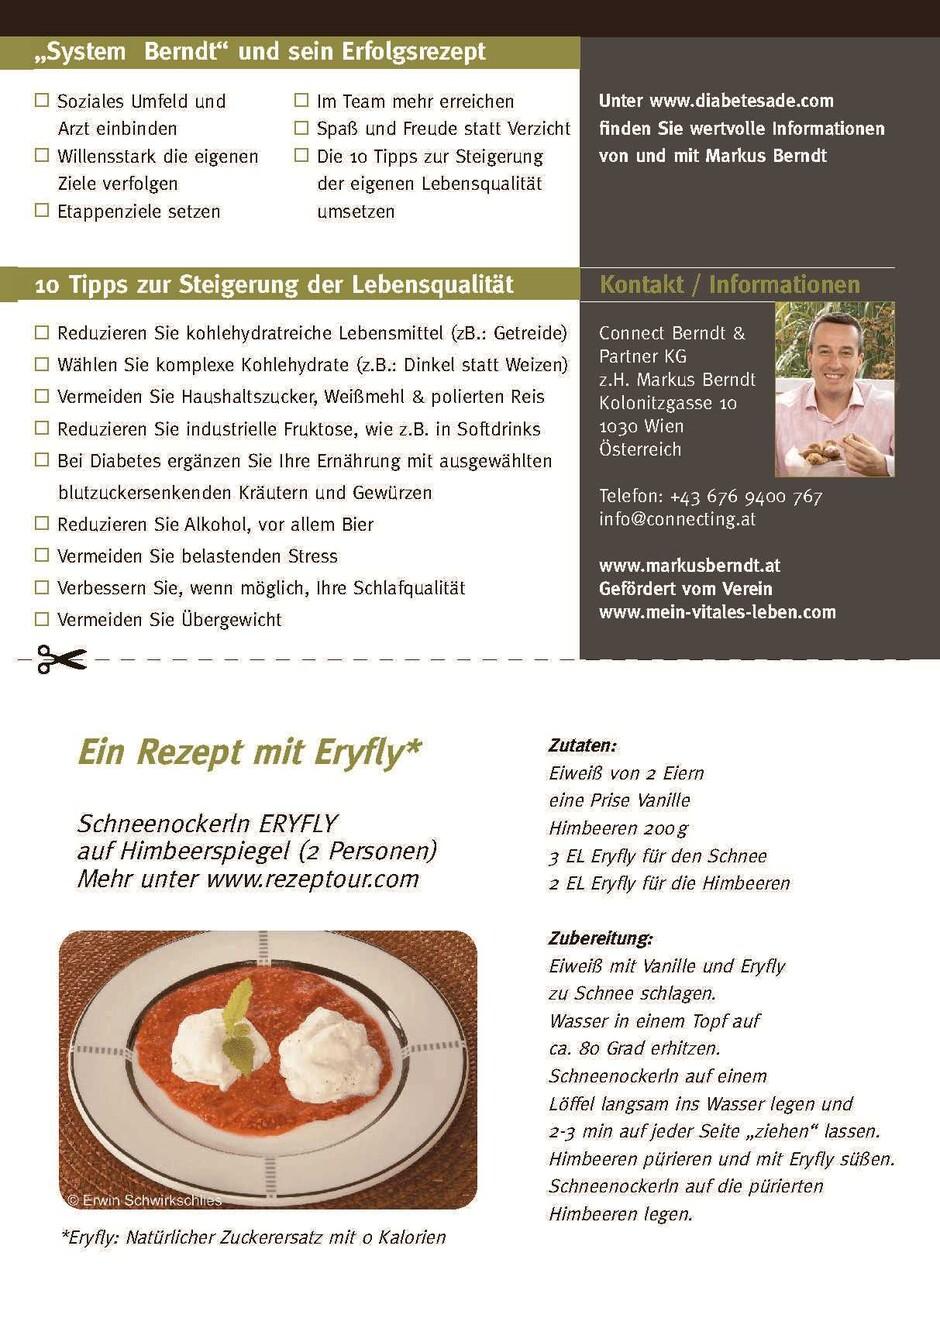 Diabetes-Mittagessen-Rezepte